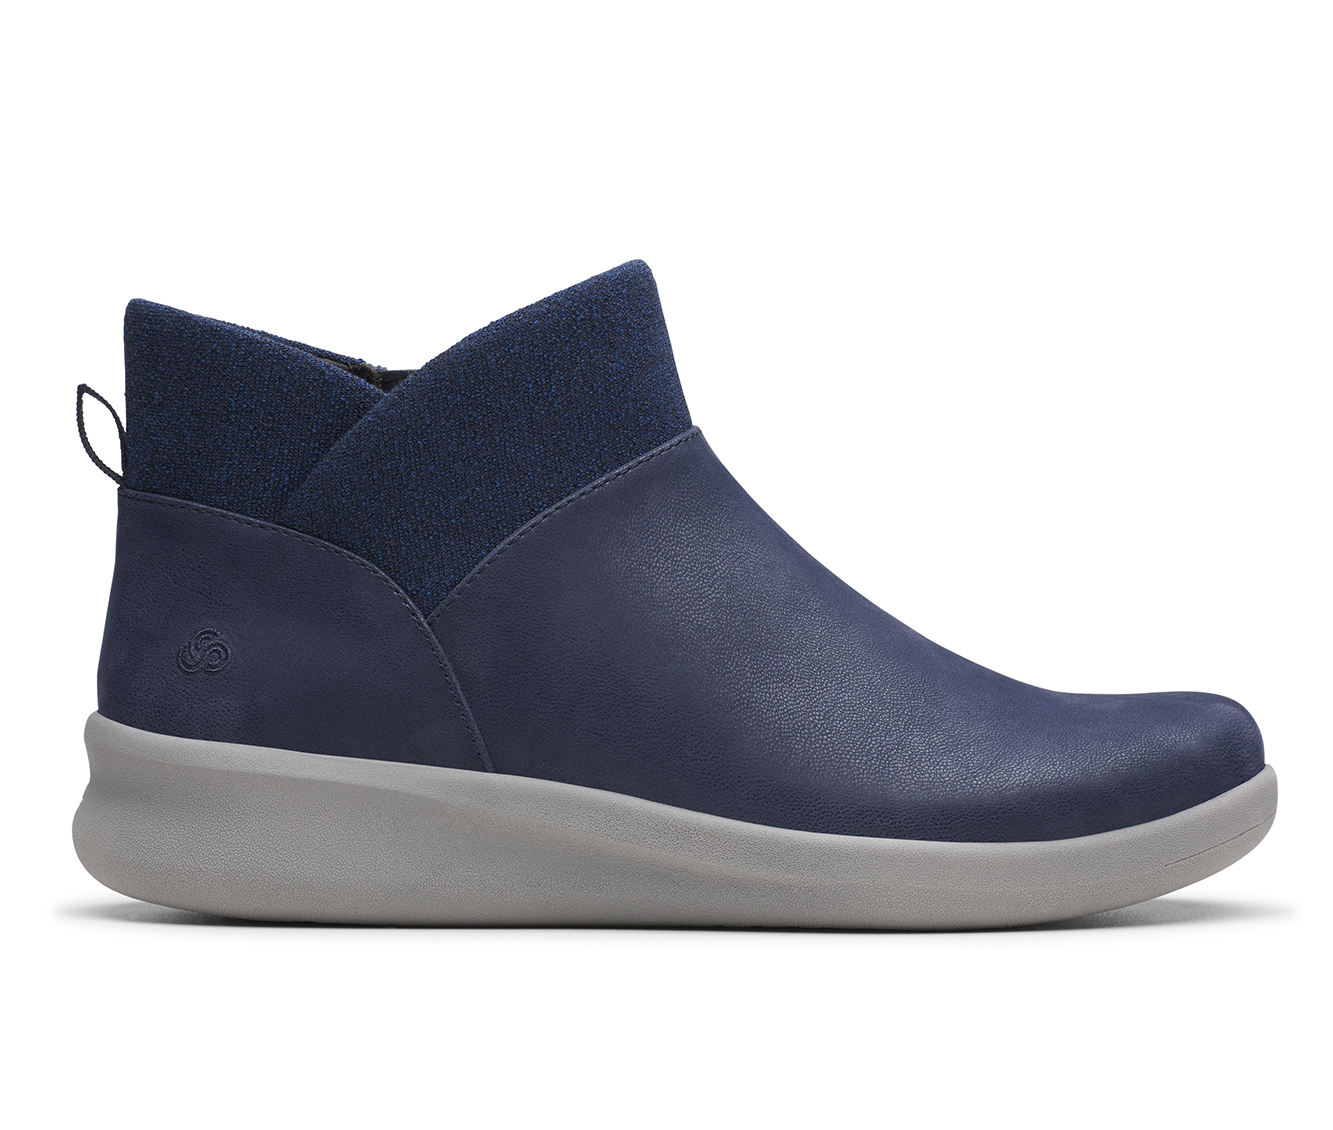 Clarks Sillian 2.0 Dusk Women's Boot (Blue Canvas)